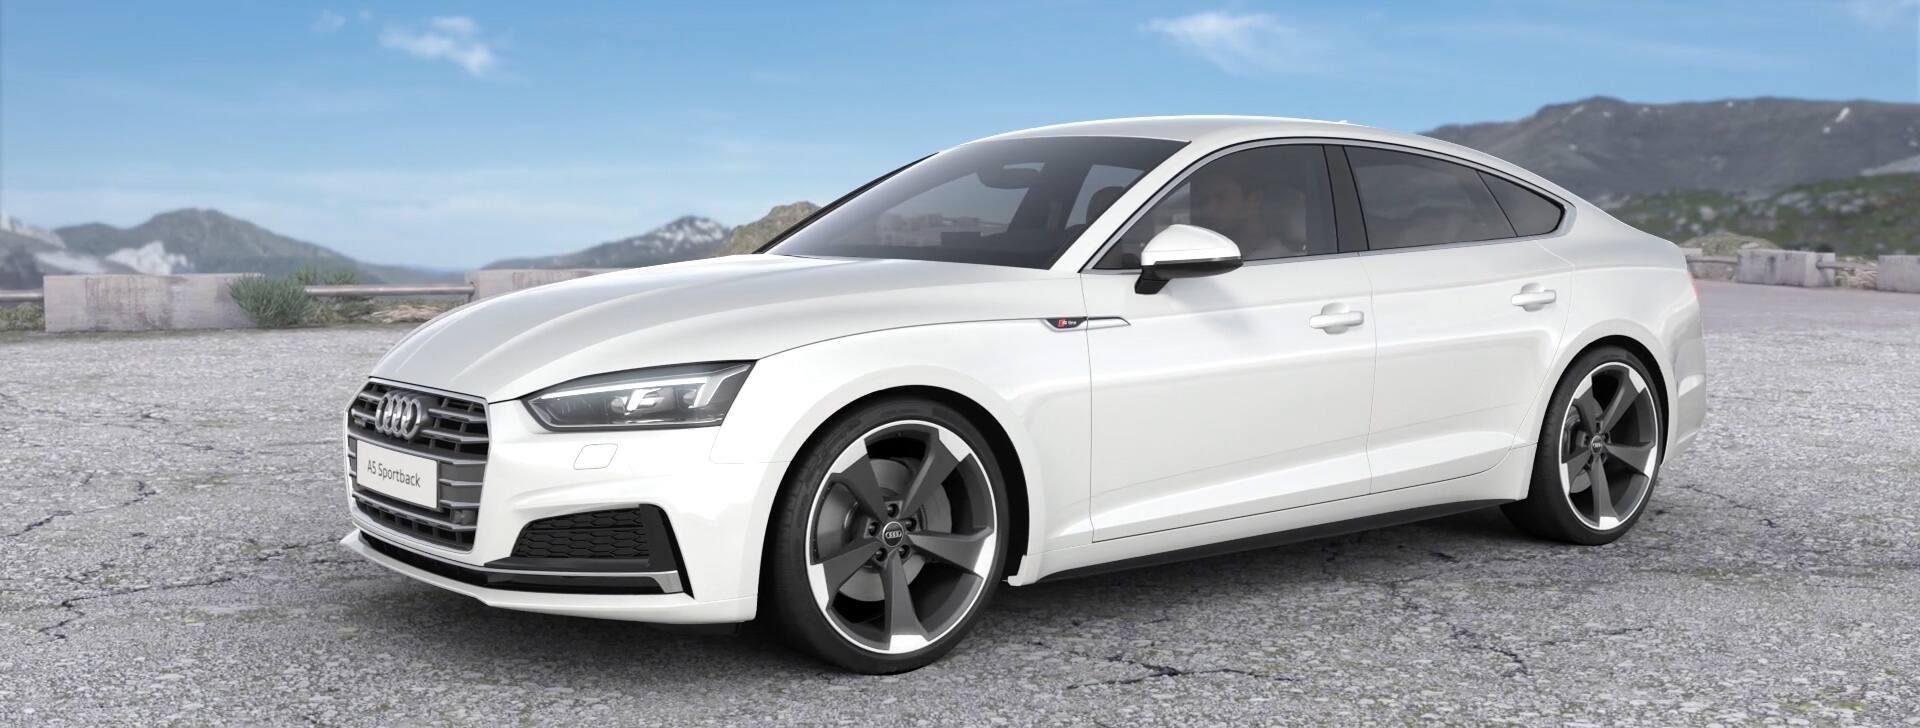 Audi A5 Sportback 2019 Audi A5 Range Audi Saudi Arabia